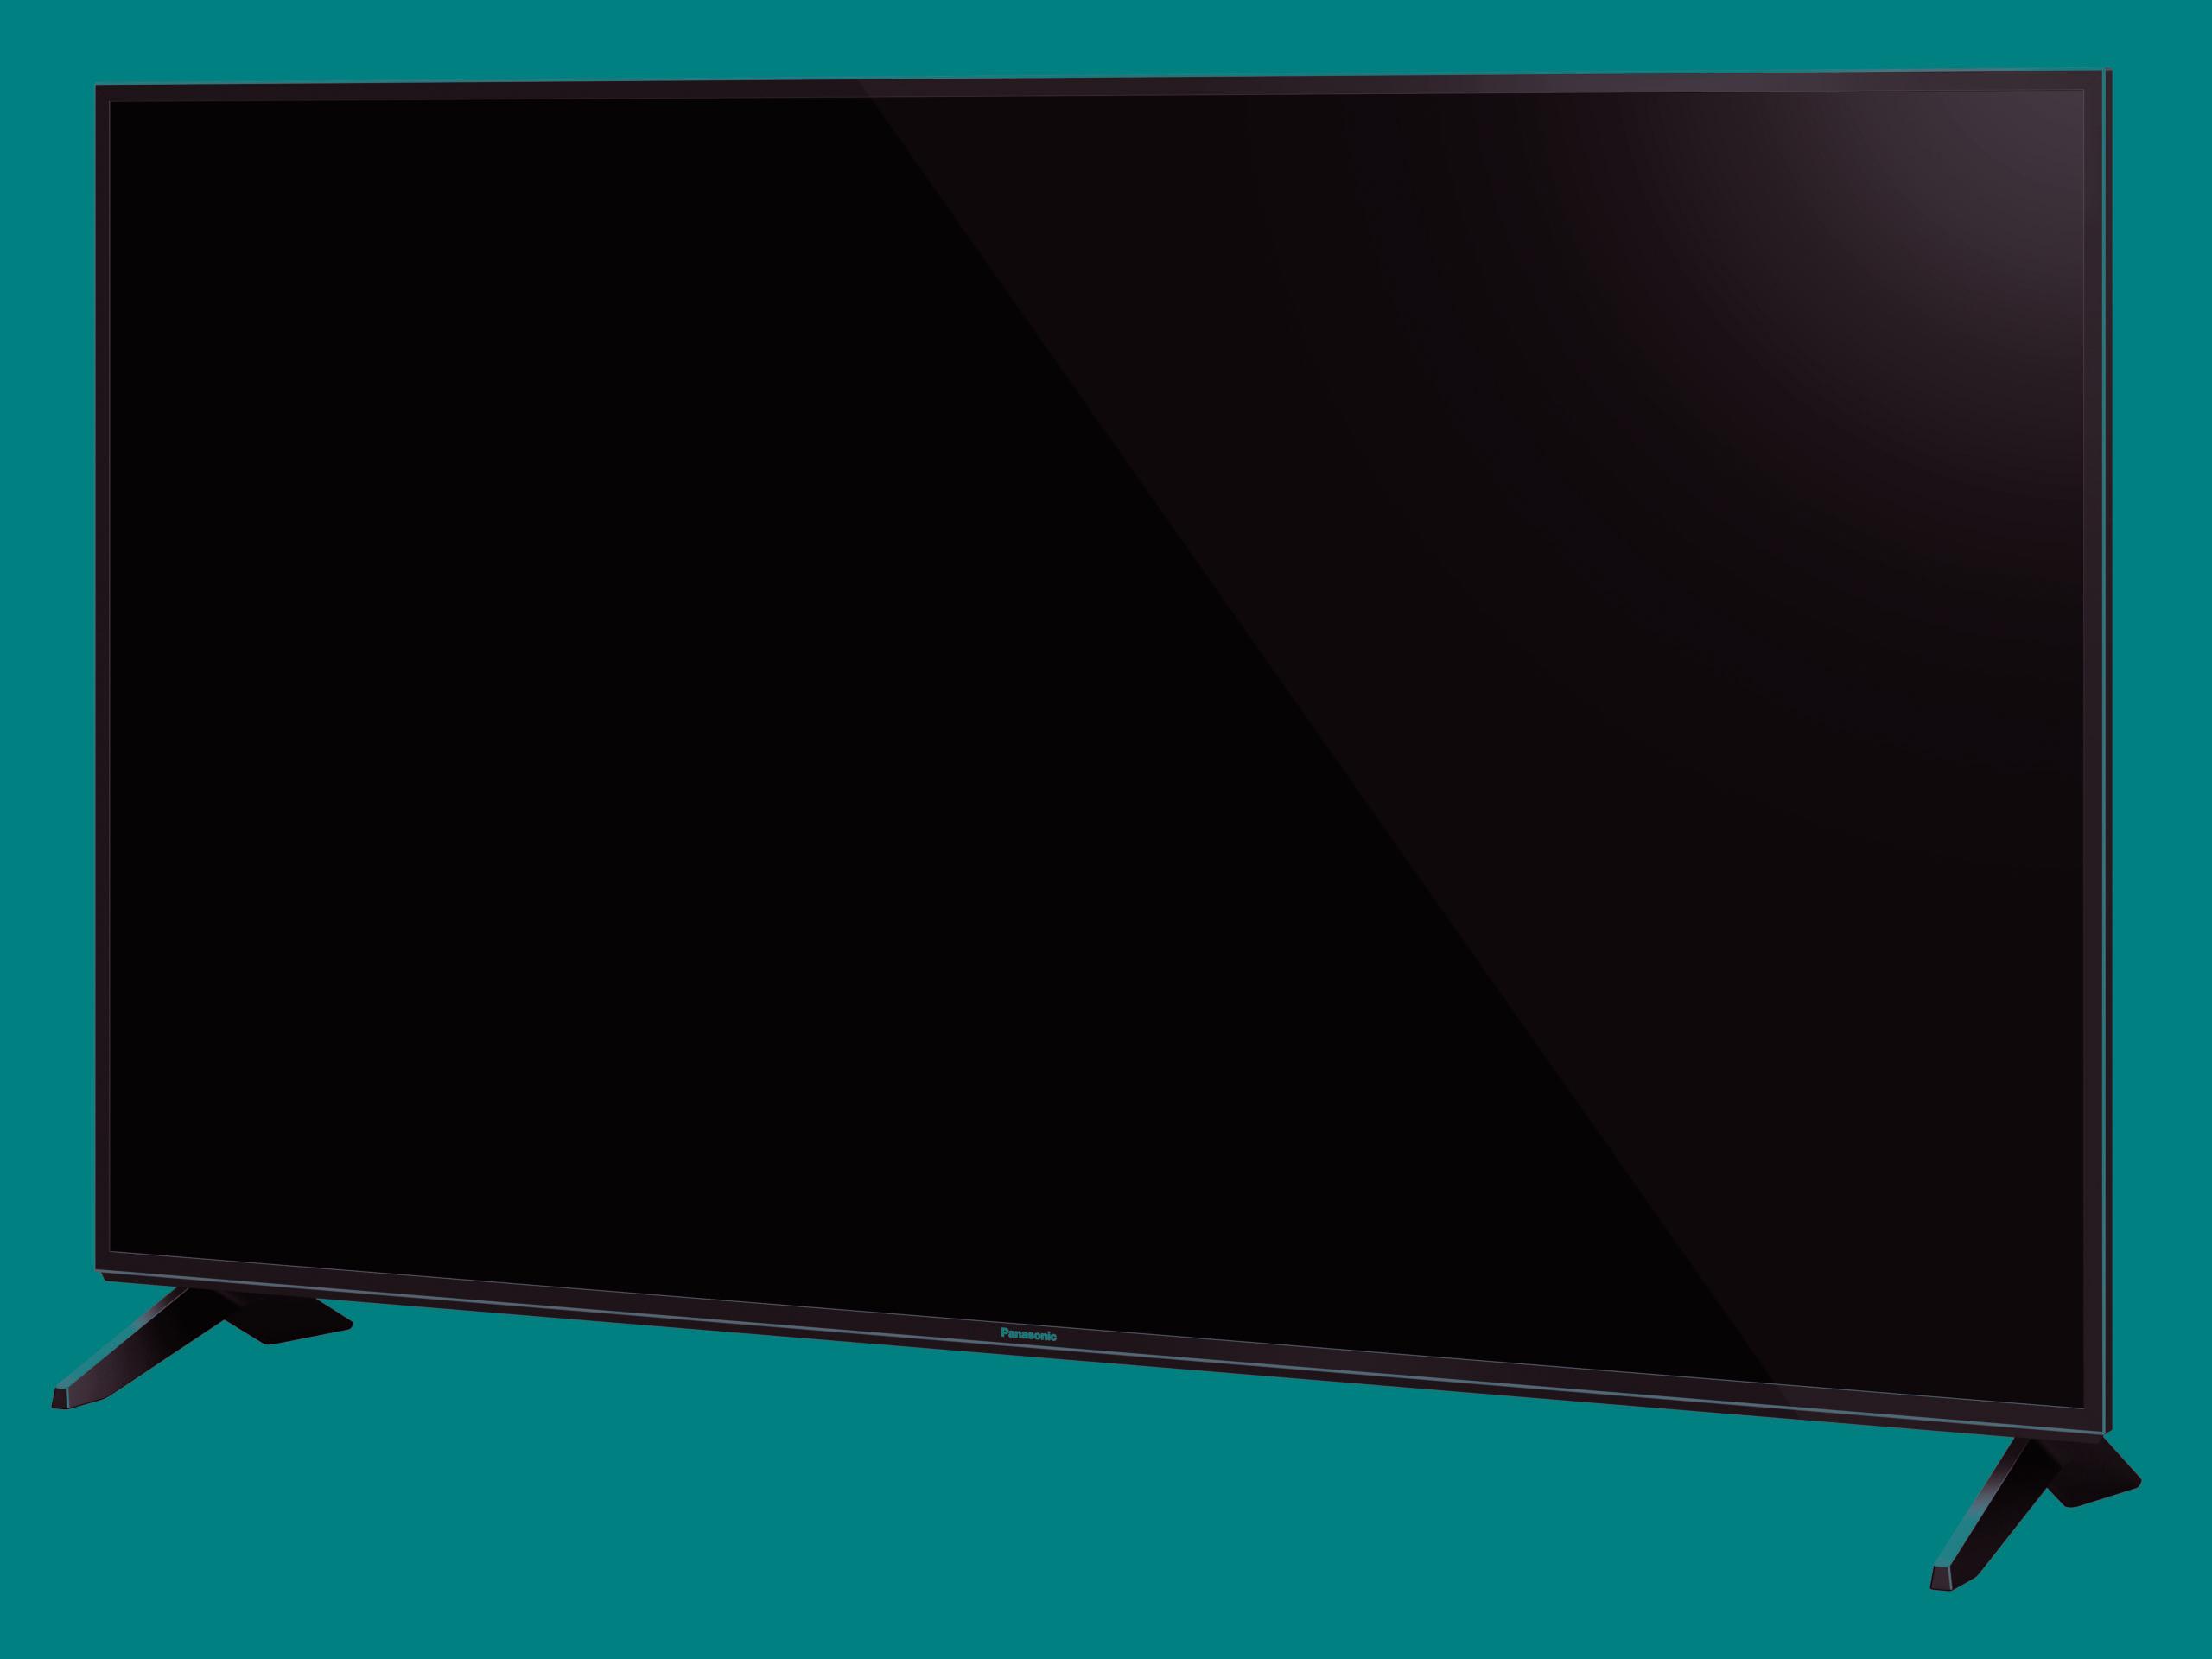 LED TV FX600 left side scaled